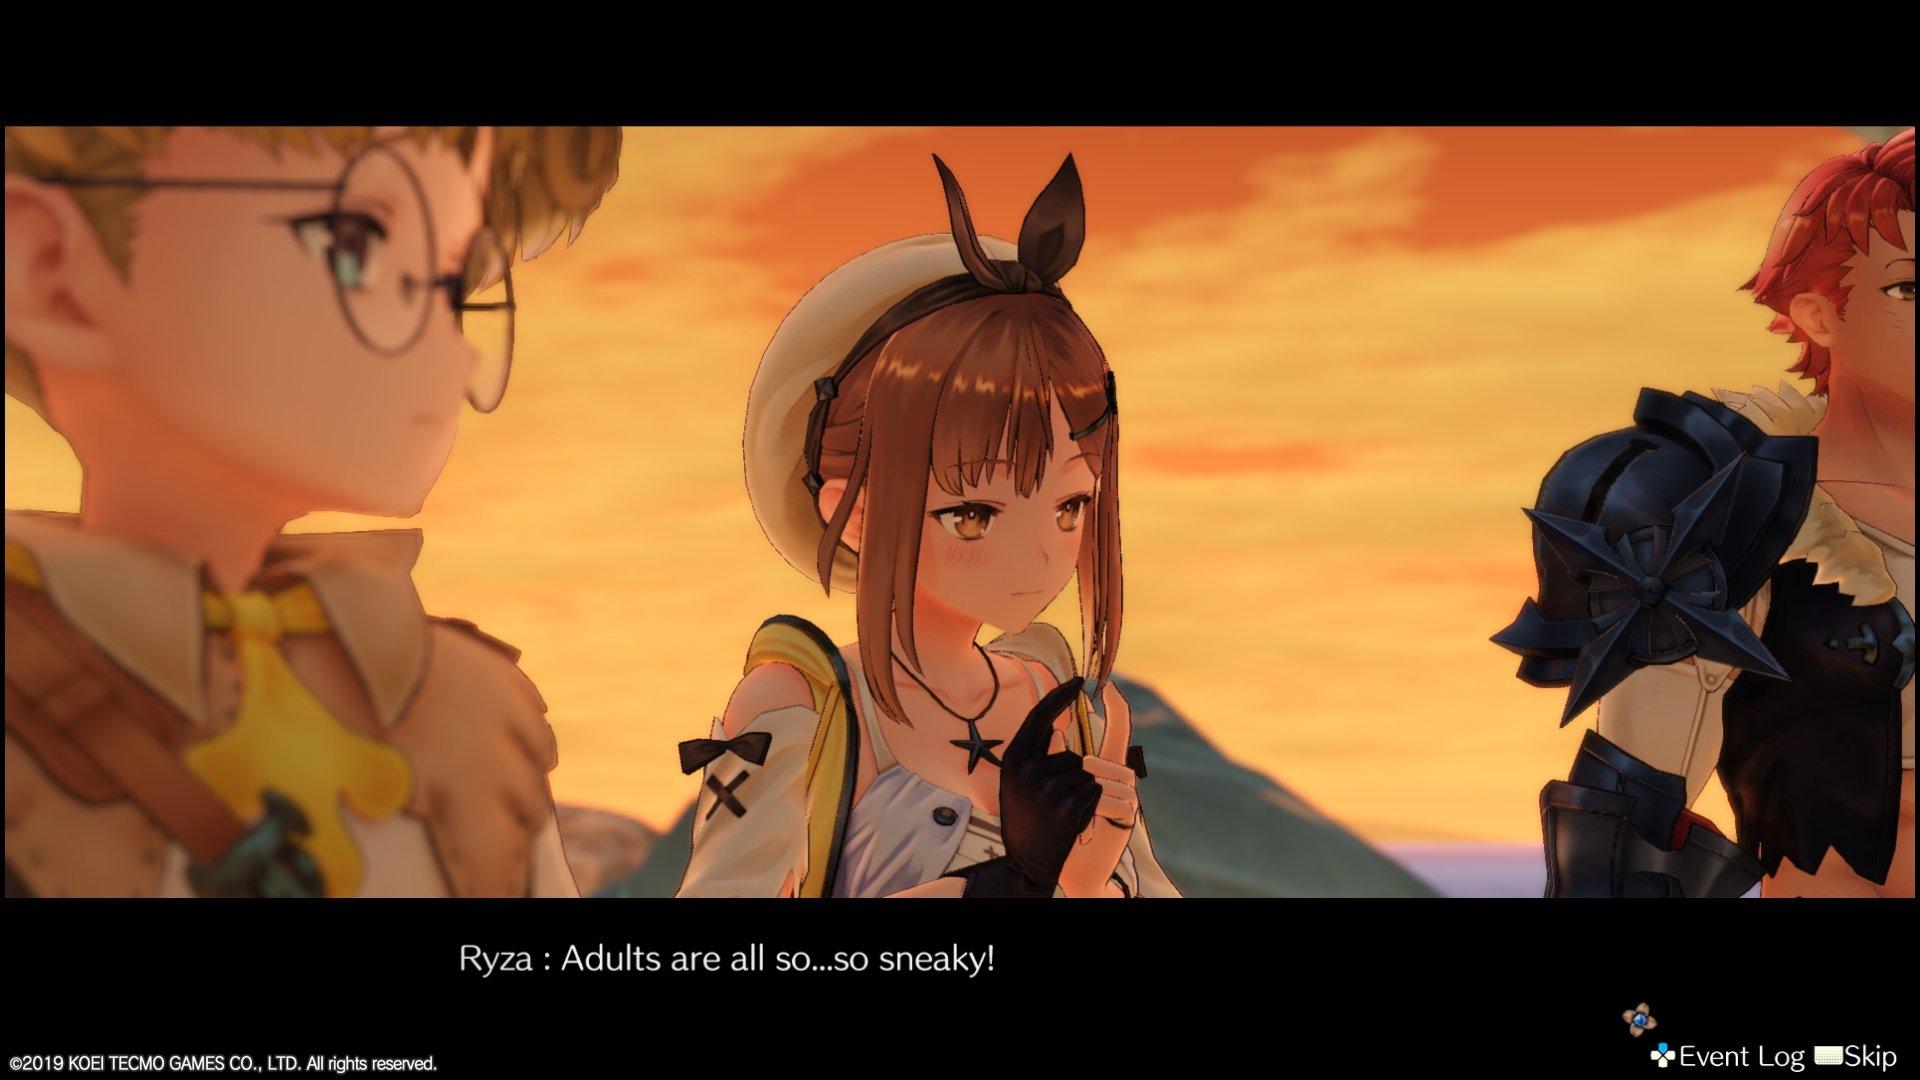 Atelier Ryza: Ever Darkness and the Secret Hideout cutscene